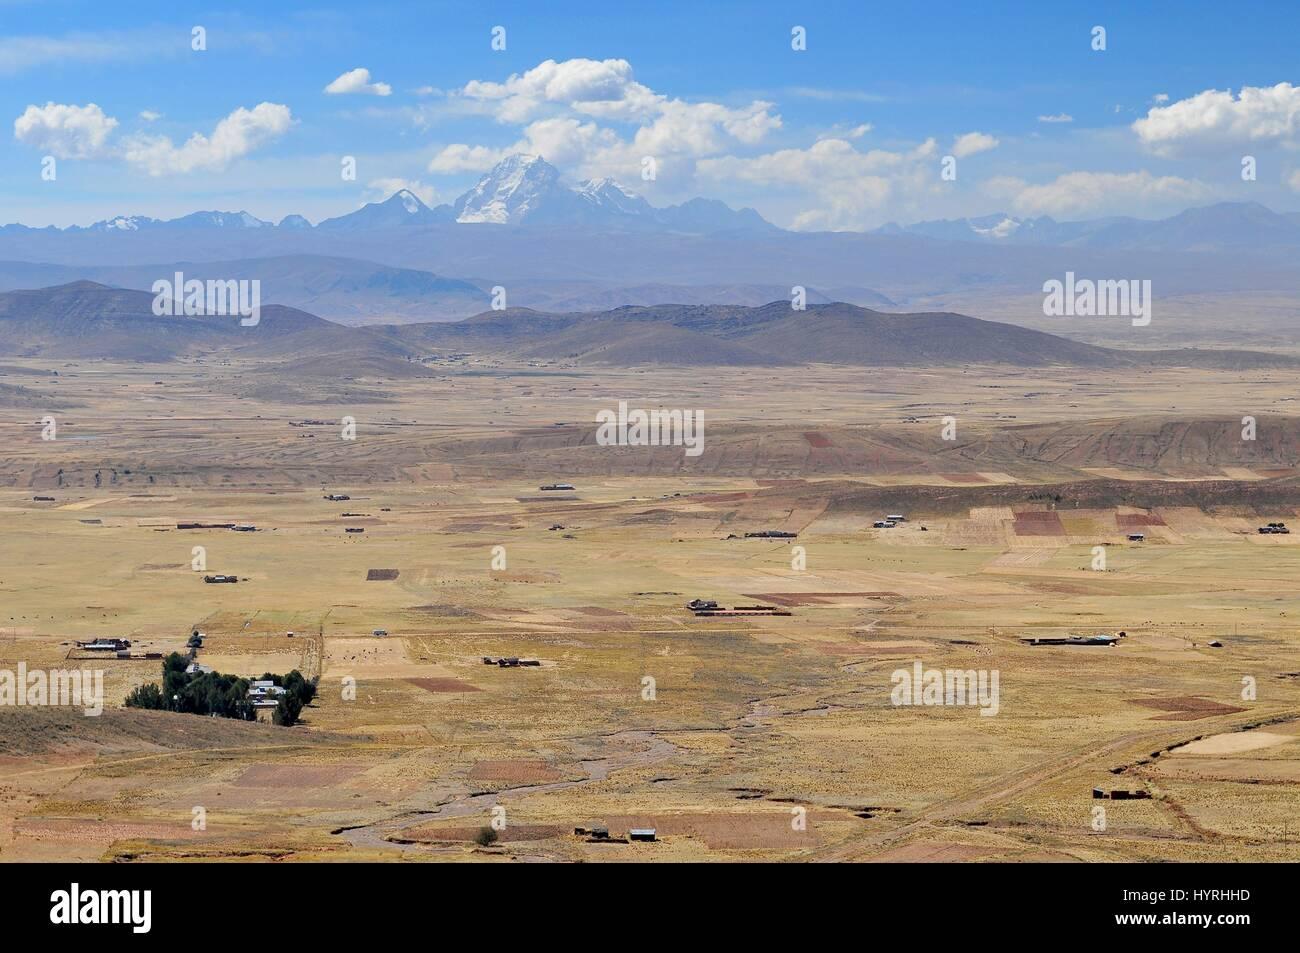 Bolivia, Cordillera Real from the Road to La Paz Stock Photo